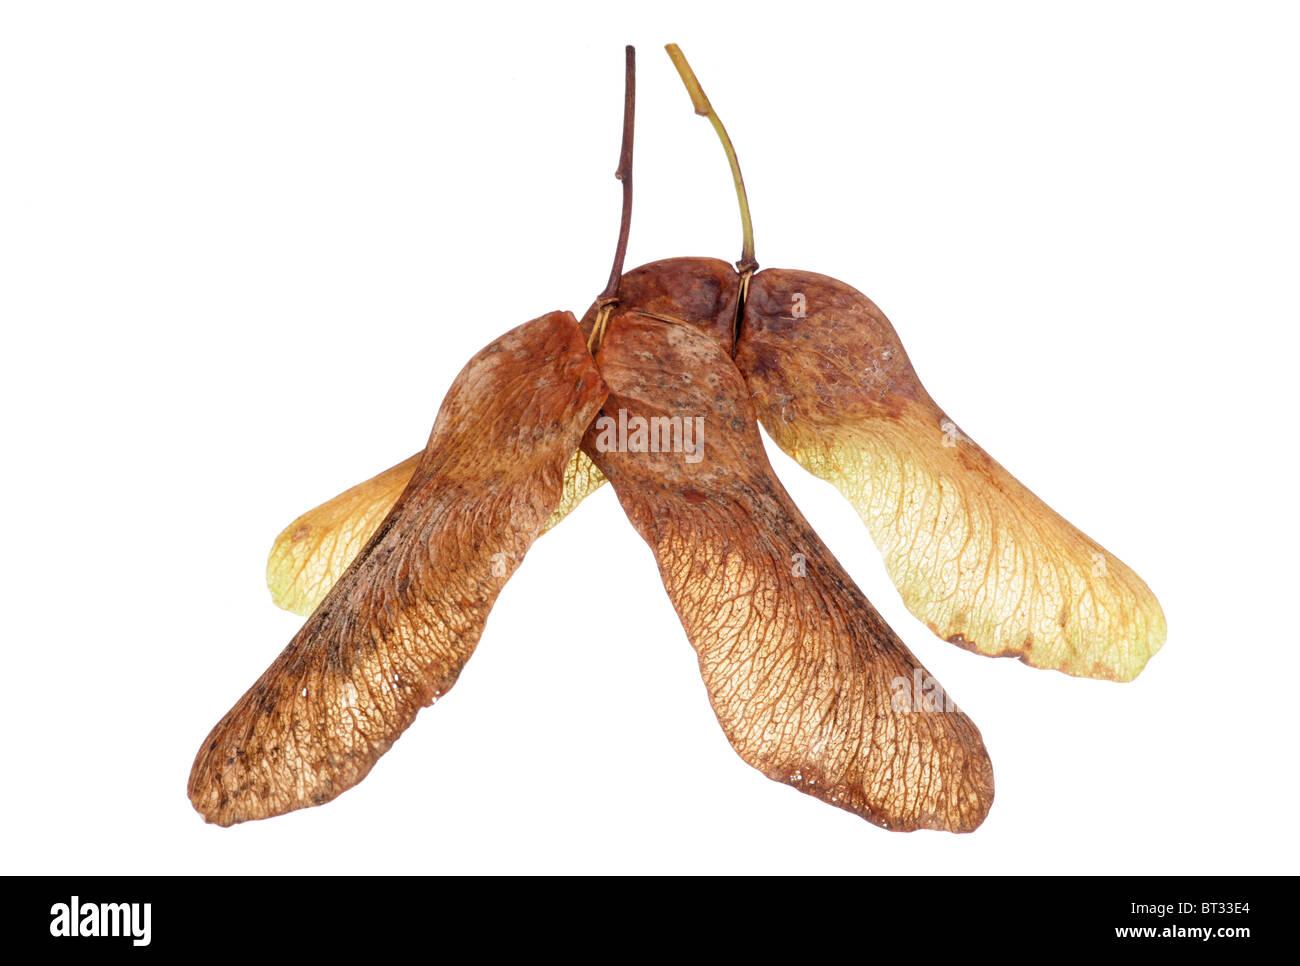 Maple tree seeds isolated in studio - Stock Image